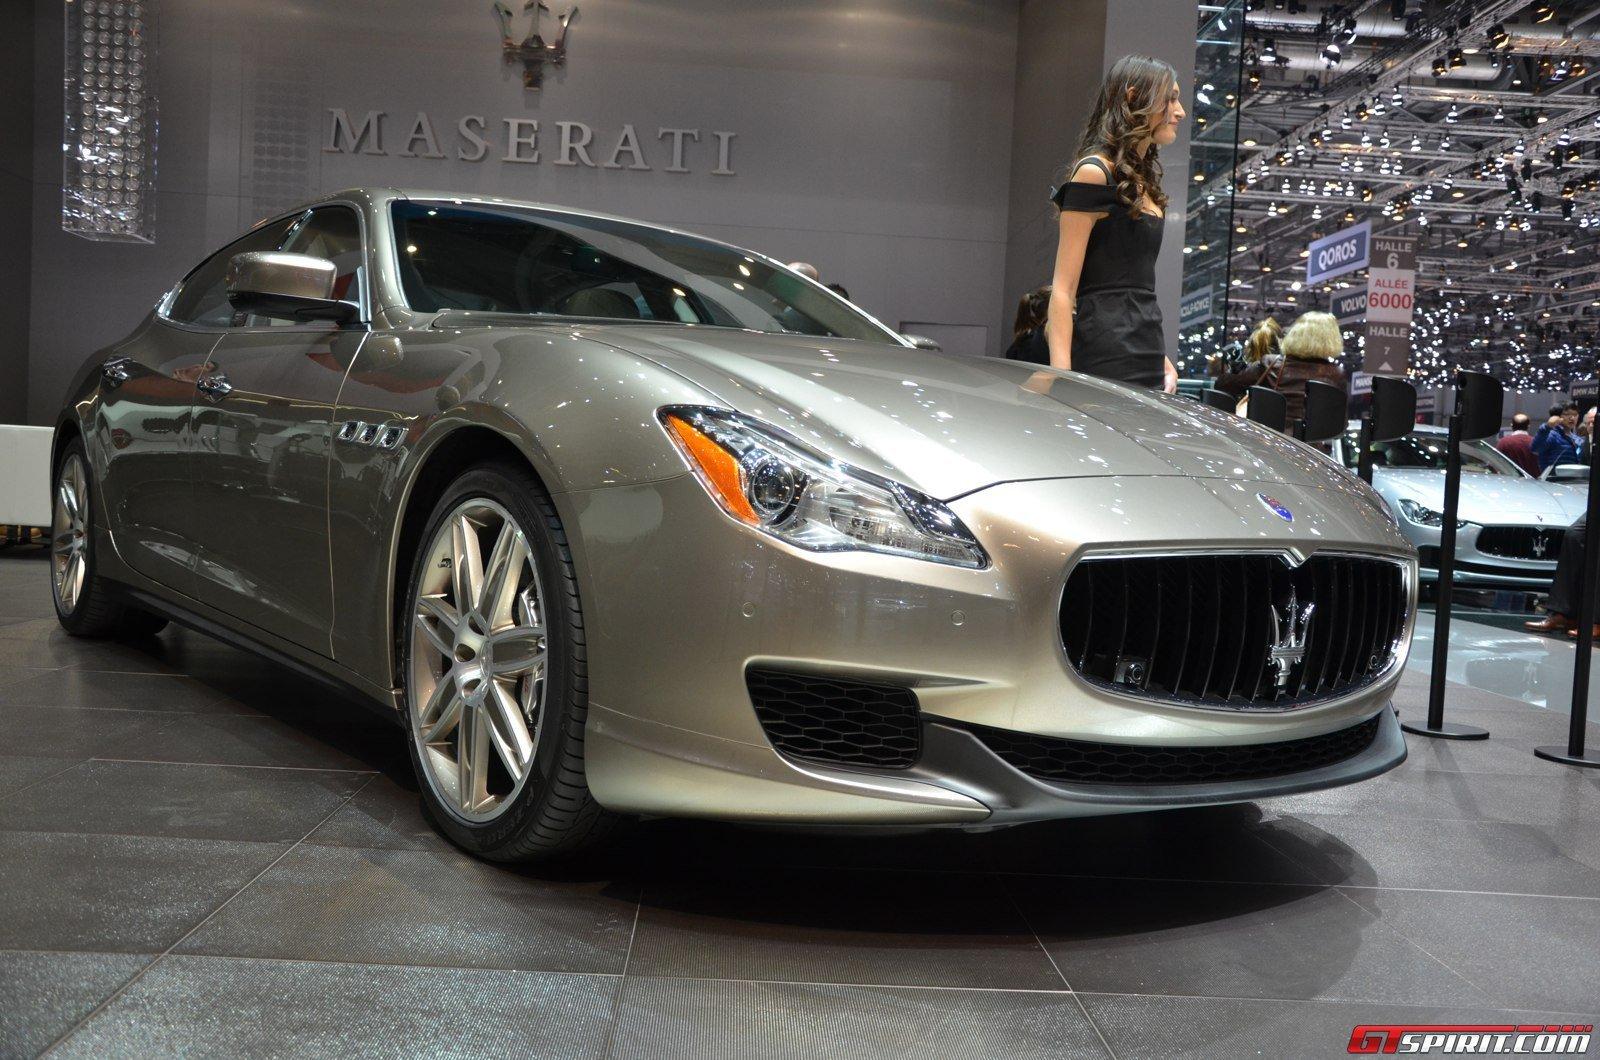 http://luxurylaunches.com/wp-content/uploads/2014/03/gtspirit-maserati-quattroporte-geneva-10.jpg